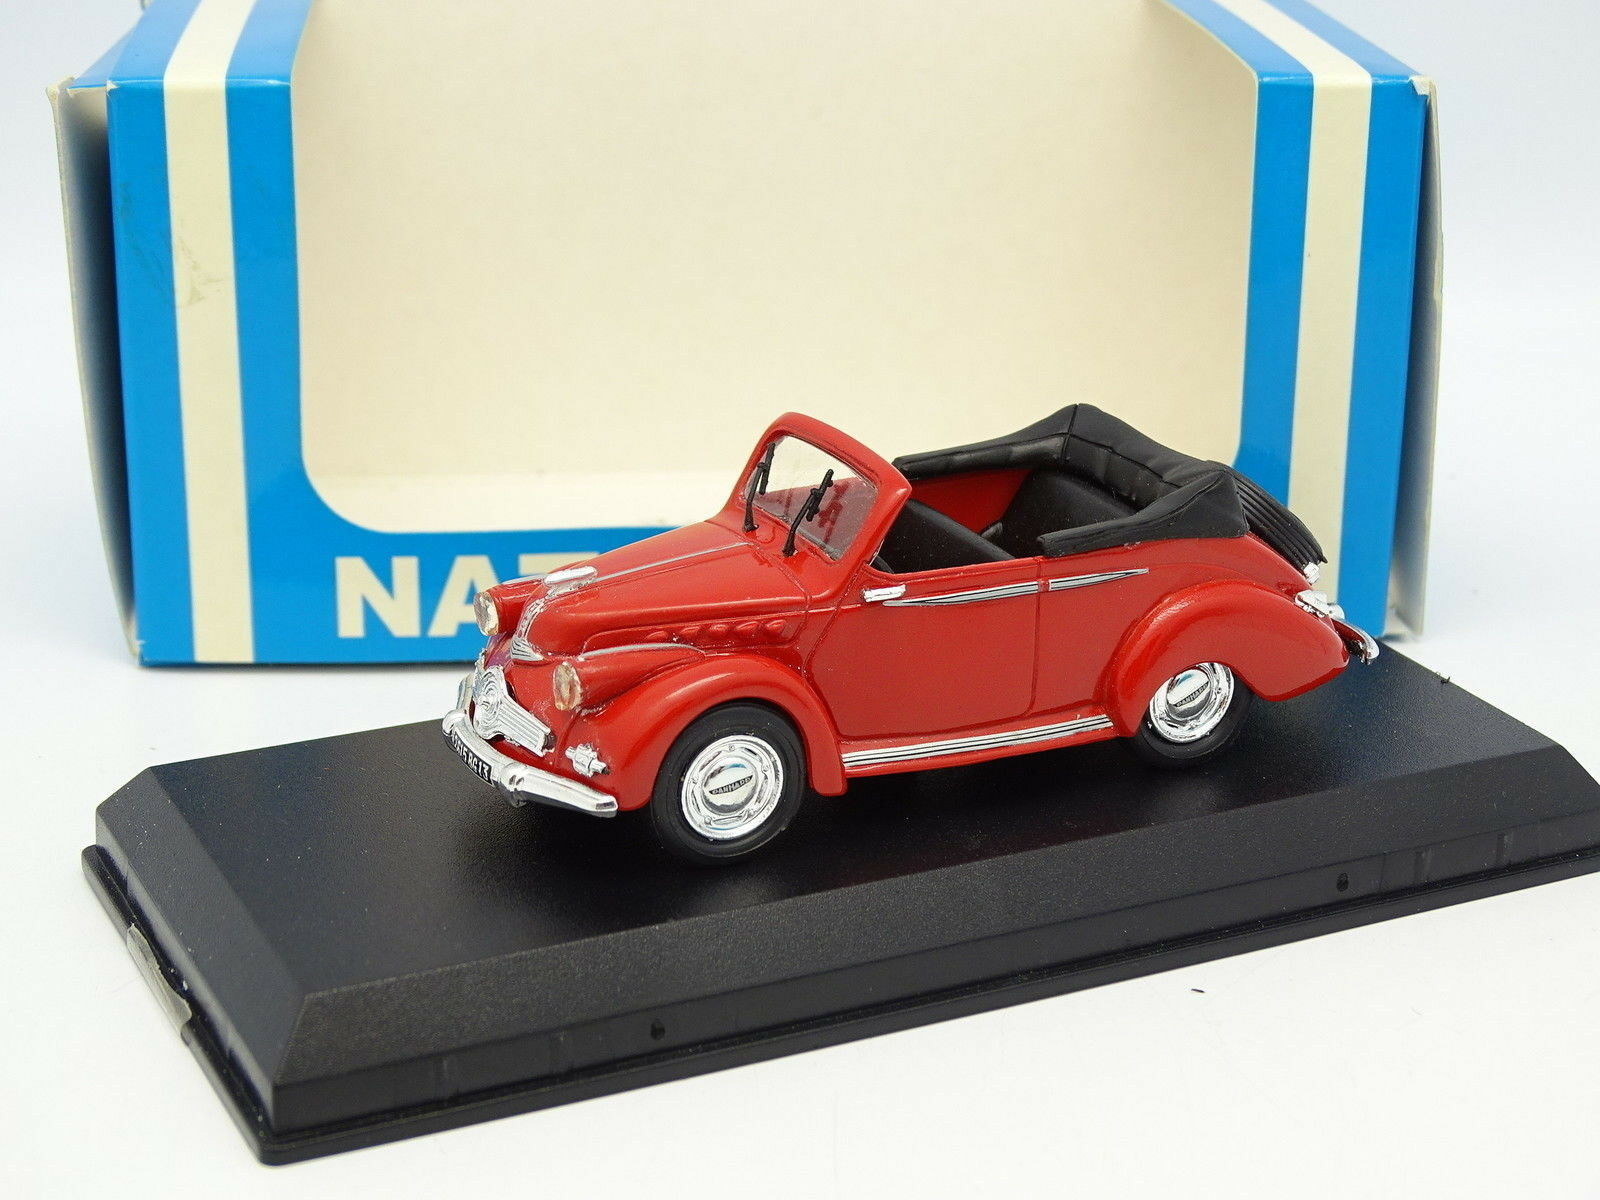 Starter N7 Provence Résine Résine Résine 1 43 - Panhard Dyna X Cabriolet Rouge ba4069